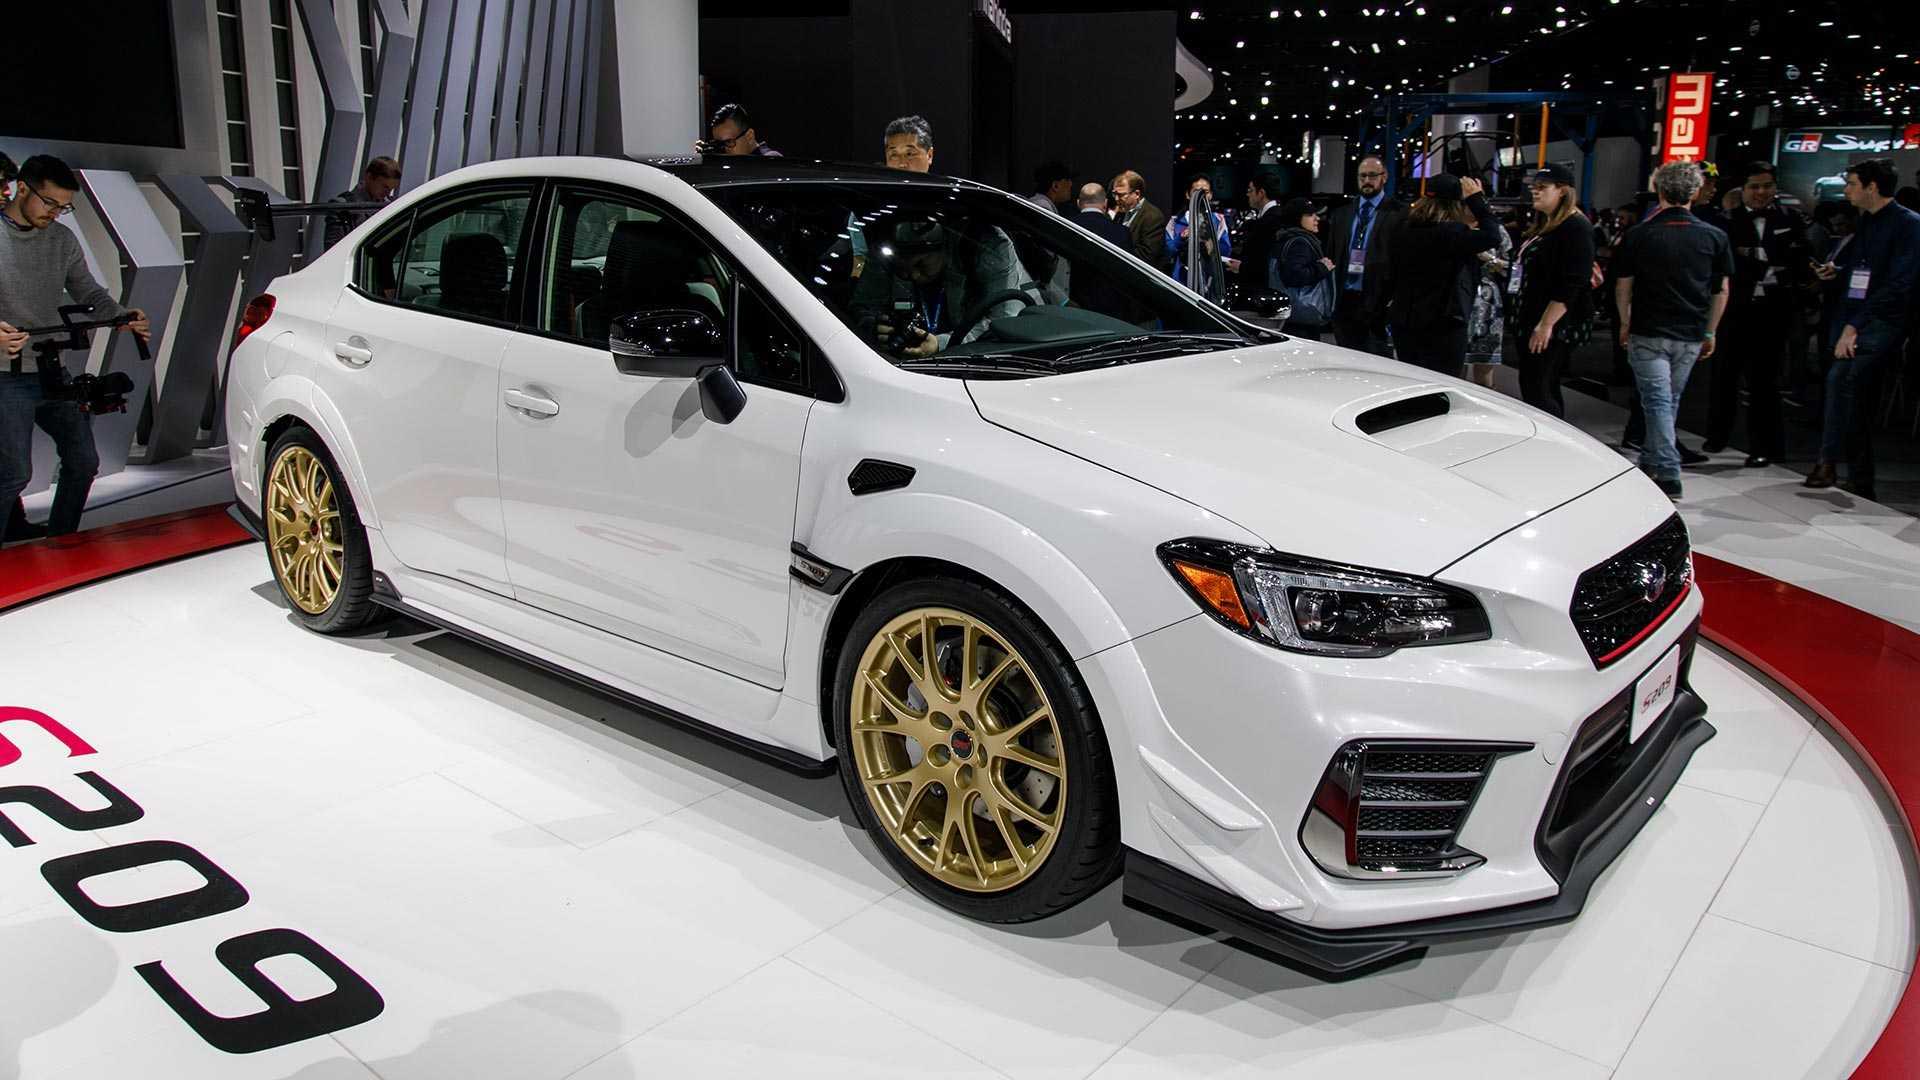 20 Best Review 2019 Subaru Wrx Sti Price for 2019 Subaru Wrx Sti